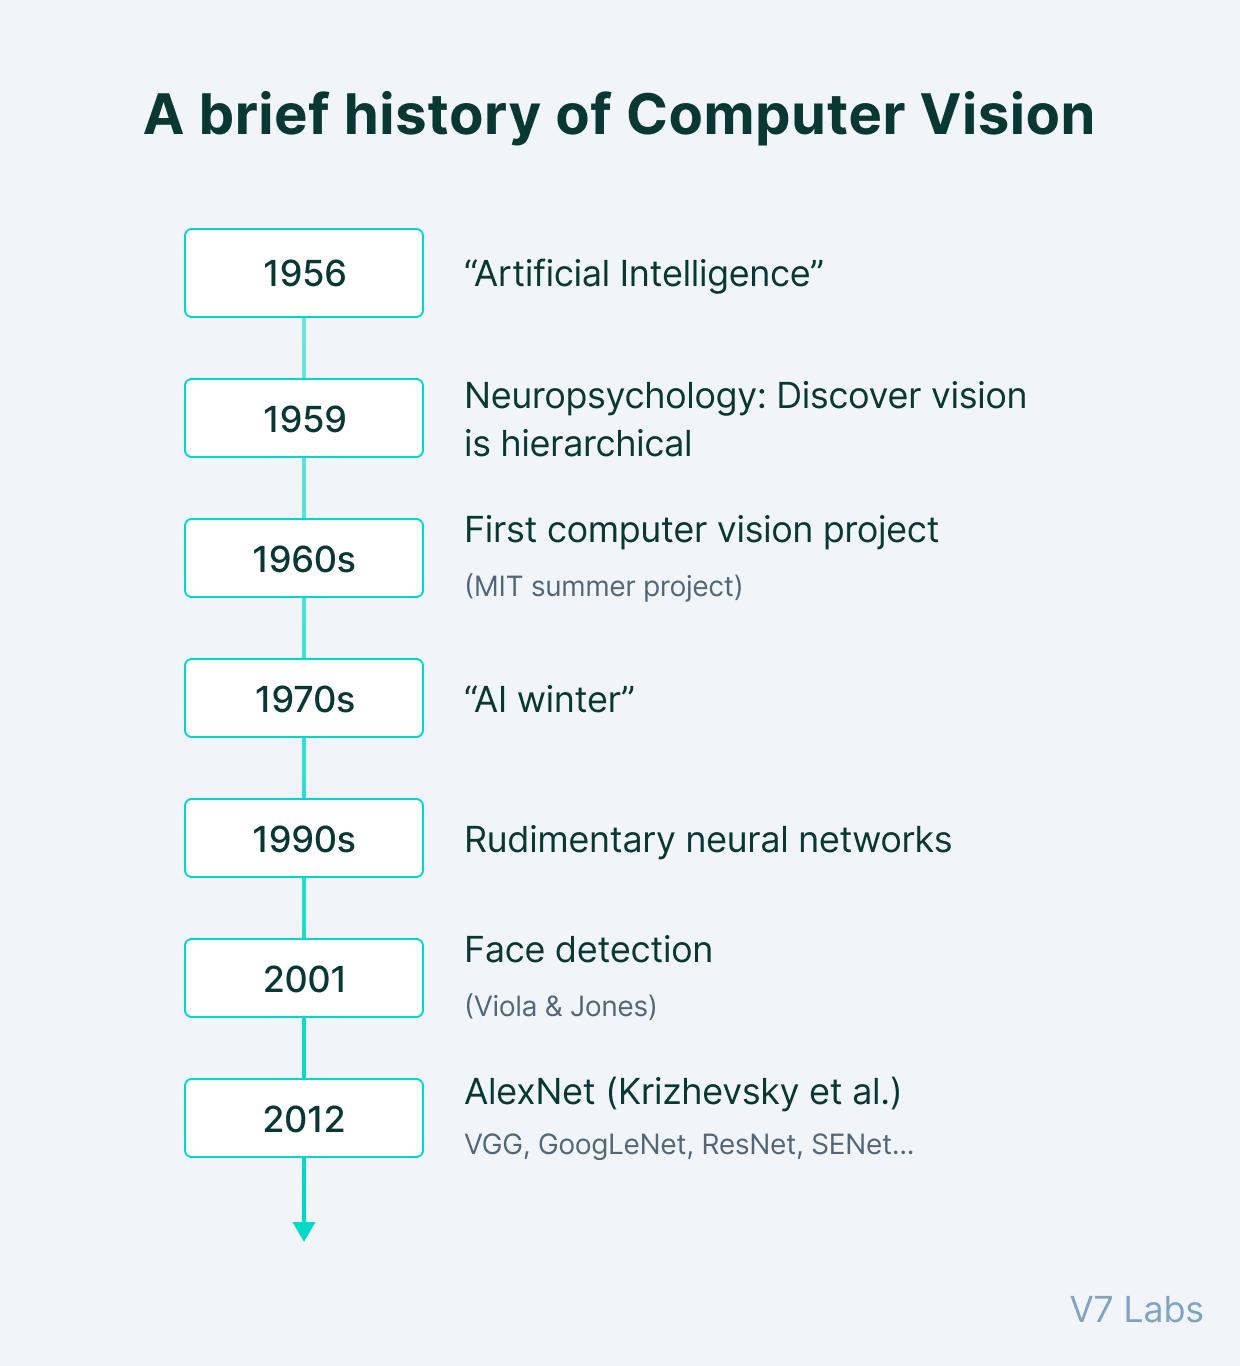 Computer vision history timeline